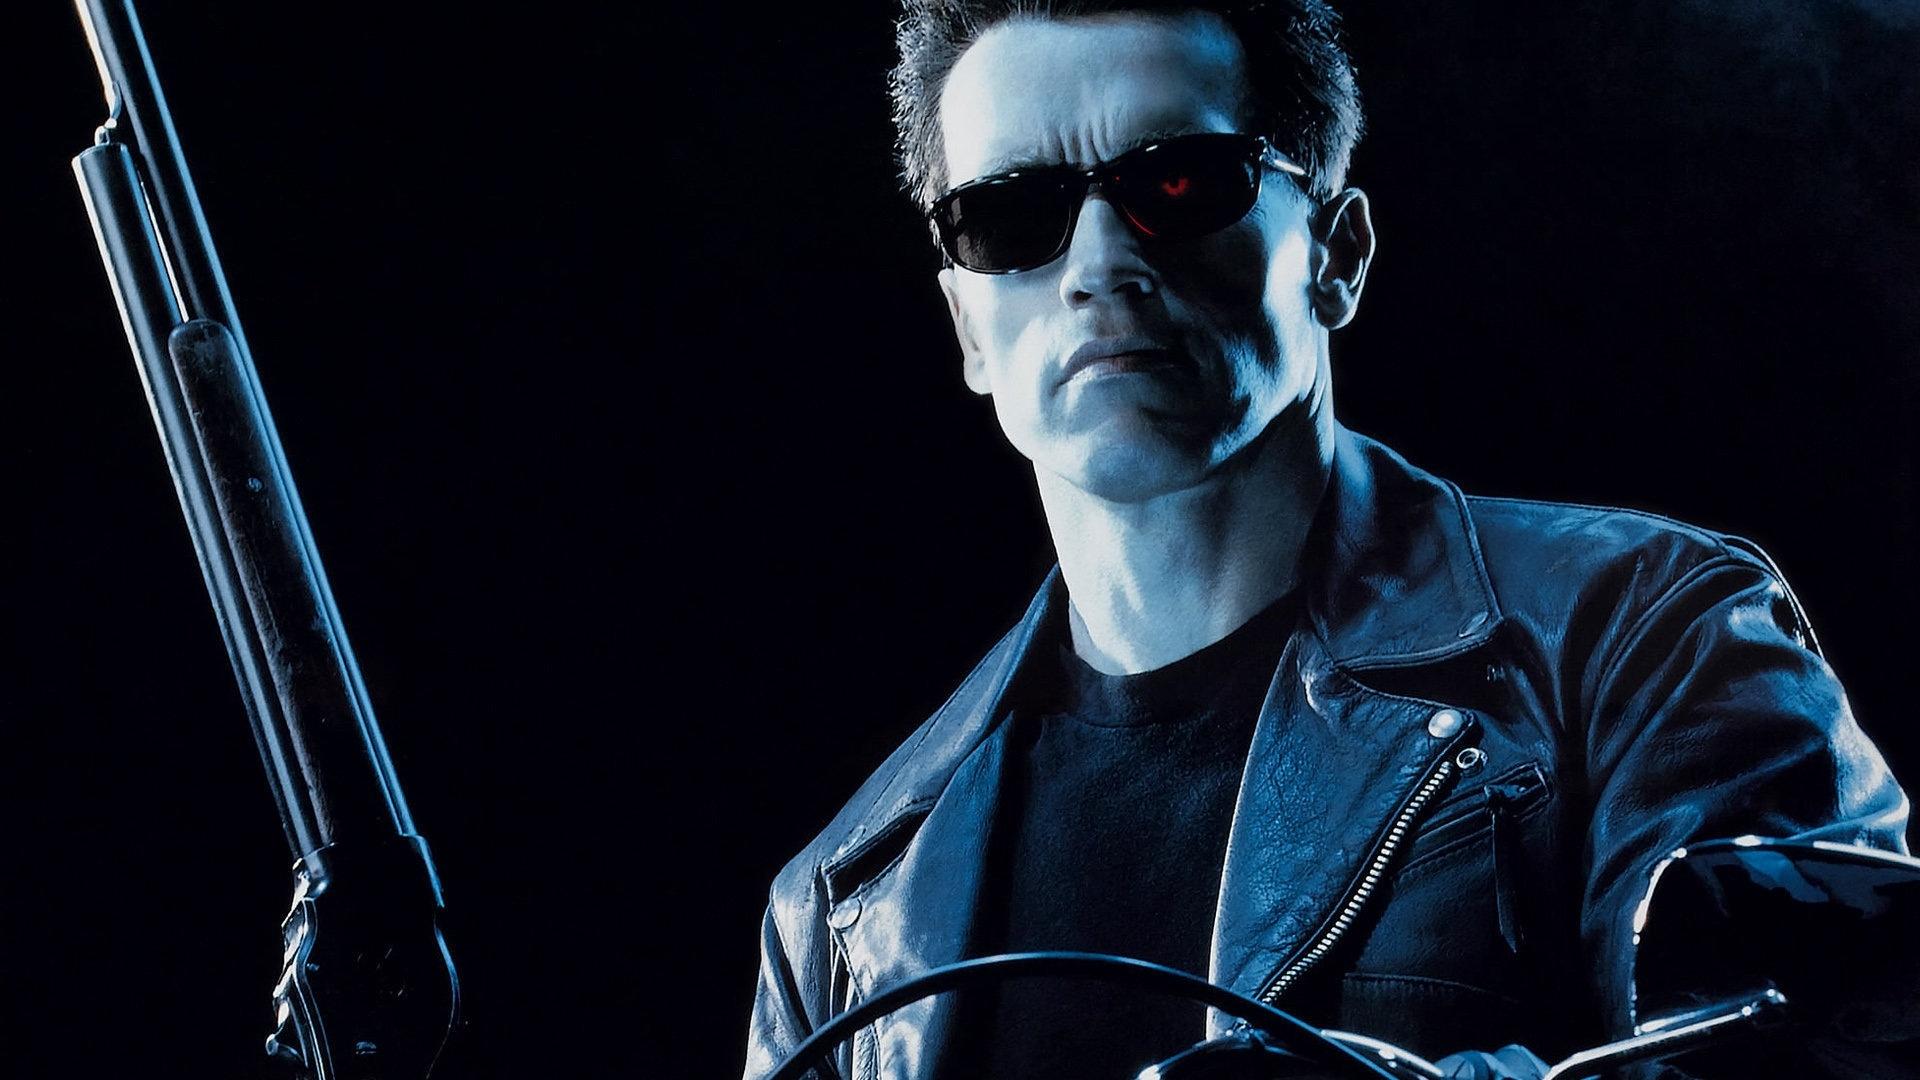 27857 download wallpaper Cinema, People, Actors, Men, Arnold Schwarzenegger, Terminator screensavers and pictures for free